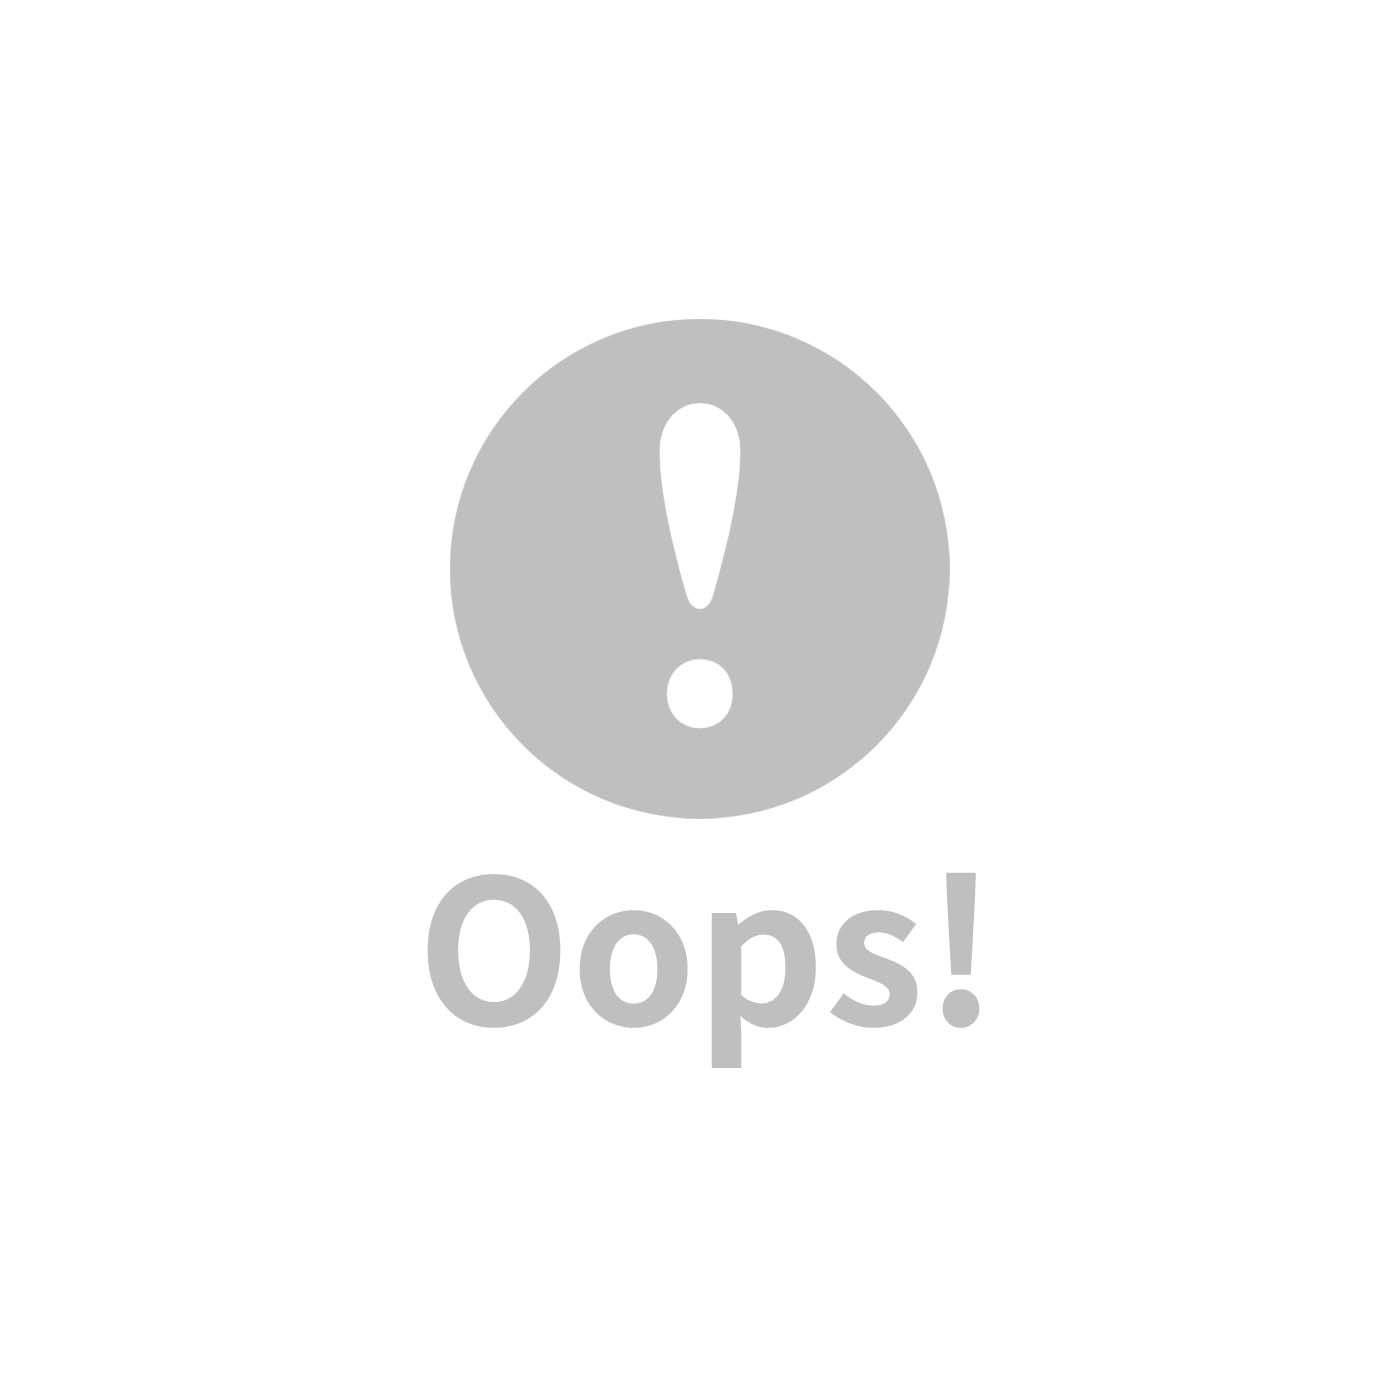 Cuna Tent x Sagepole成長美學小木屋 (奧地利音樂城)